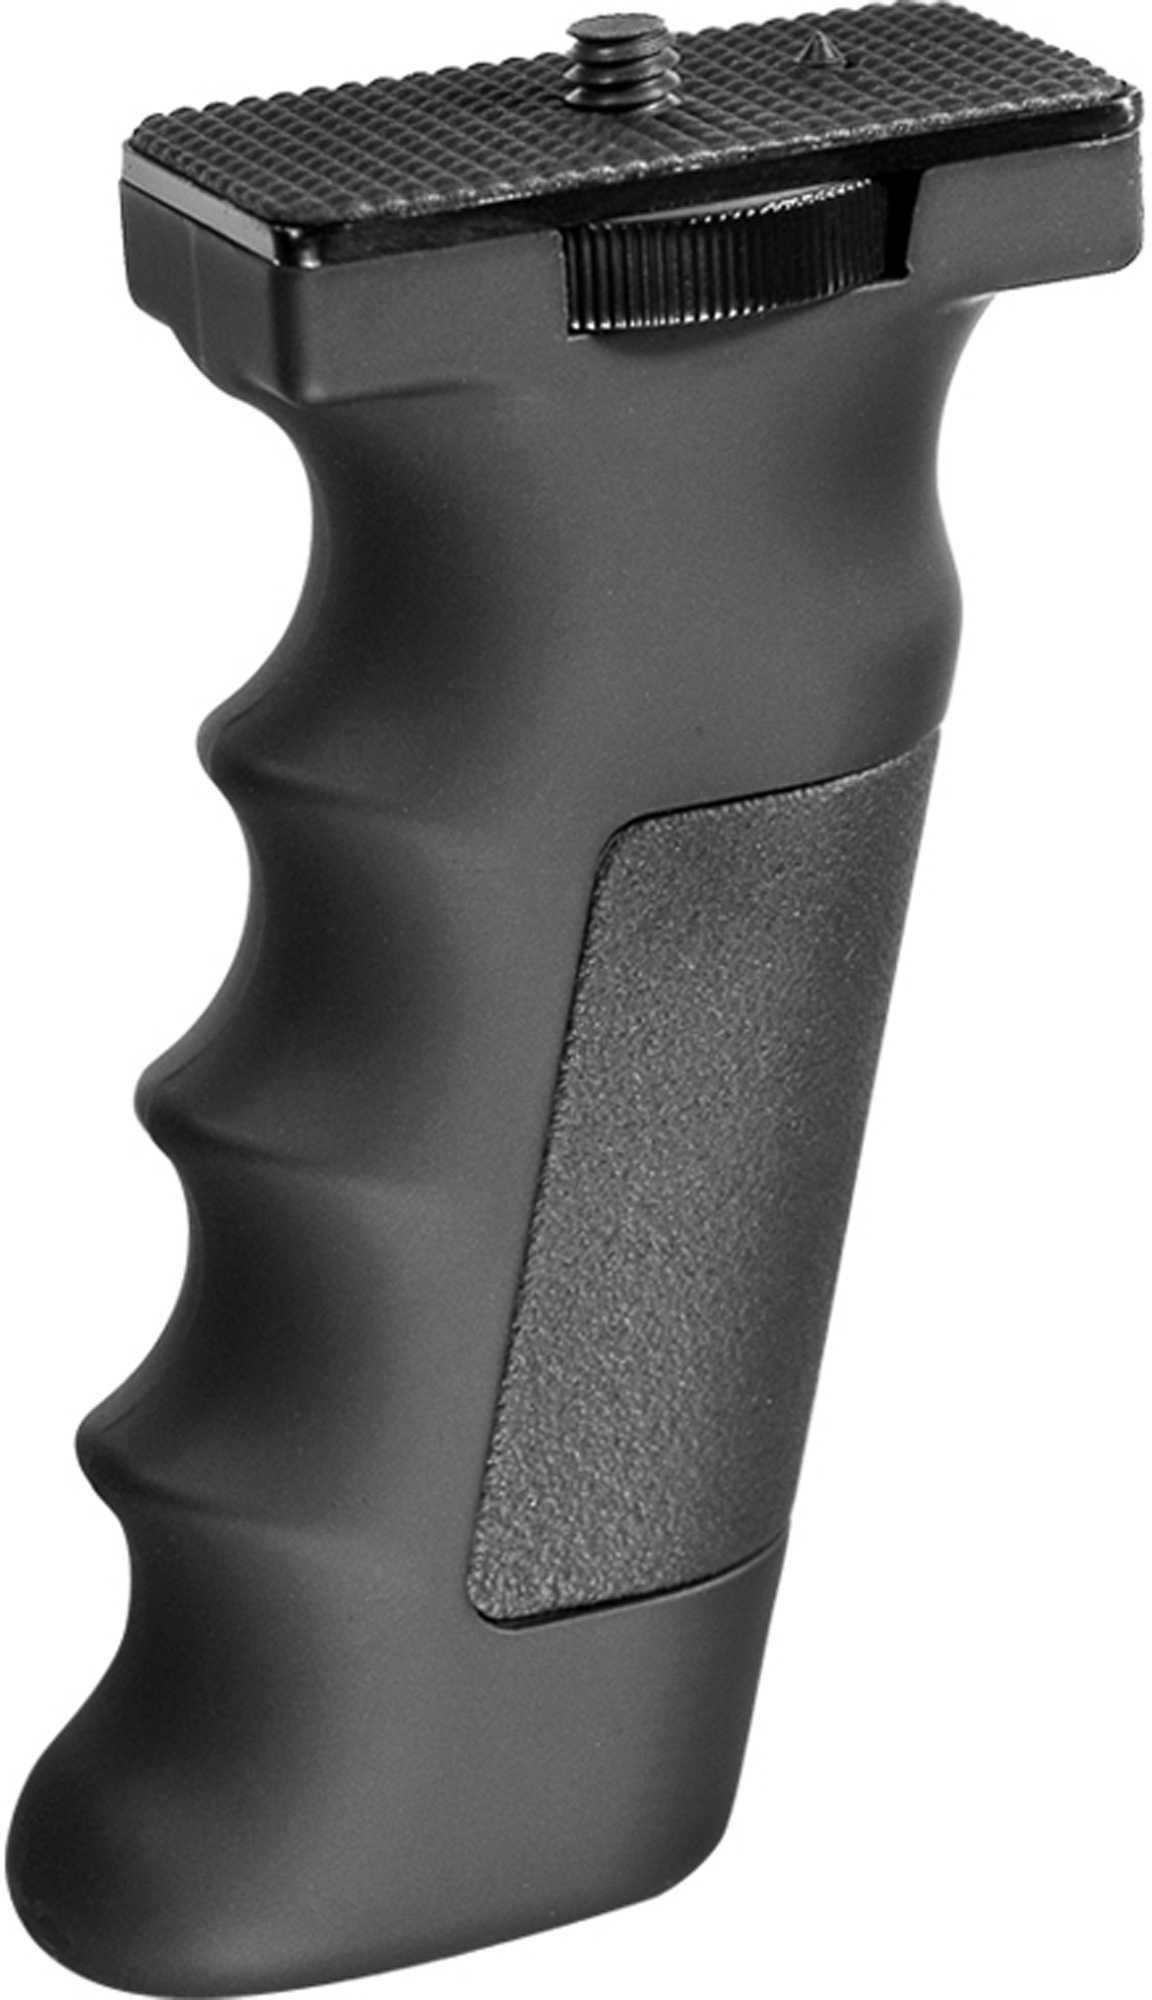 Barska Optics Tripod Accu-Grip Handheld System Md: Af10926